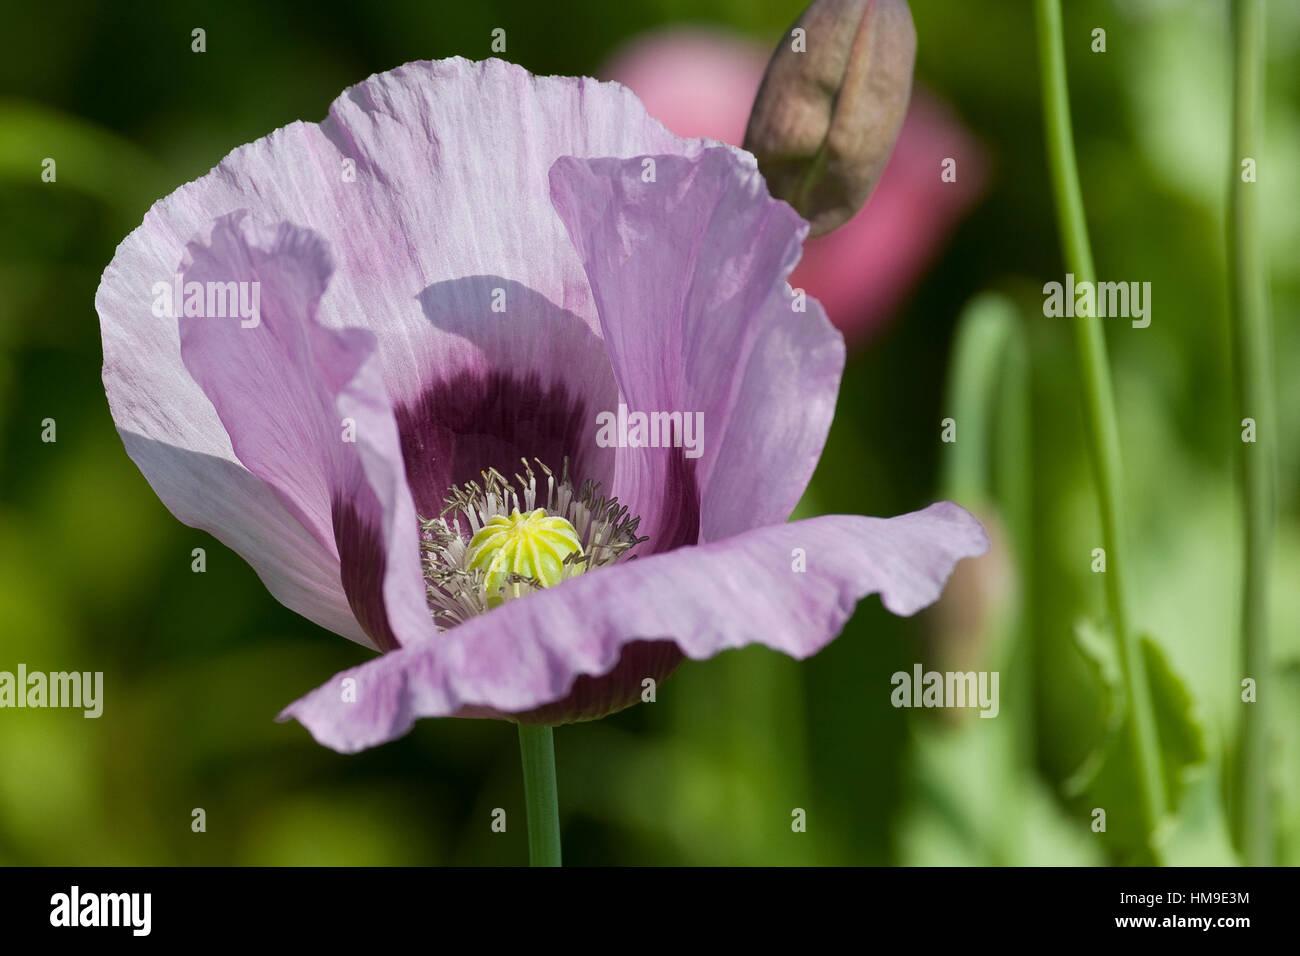 Schlaf-Mohn, Schlafmohn, Mohn, Papaver somniferum, Opium Poppy - Stock Image